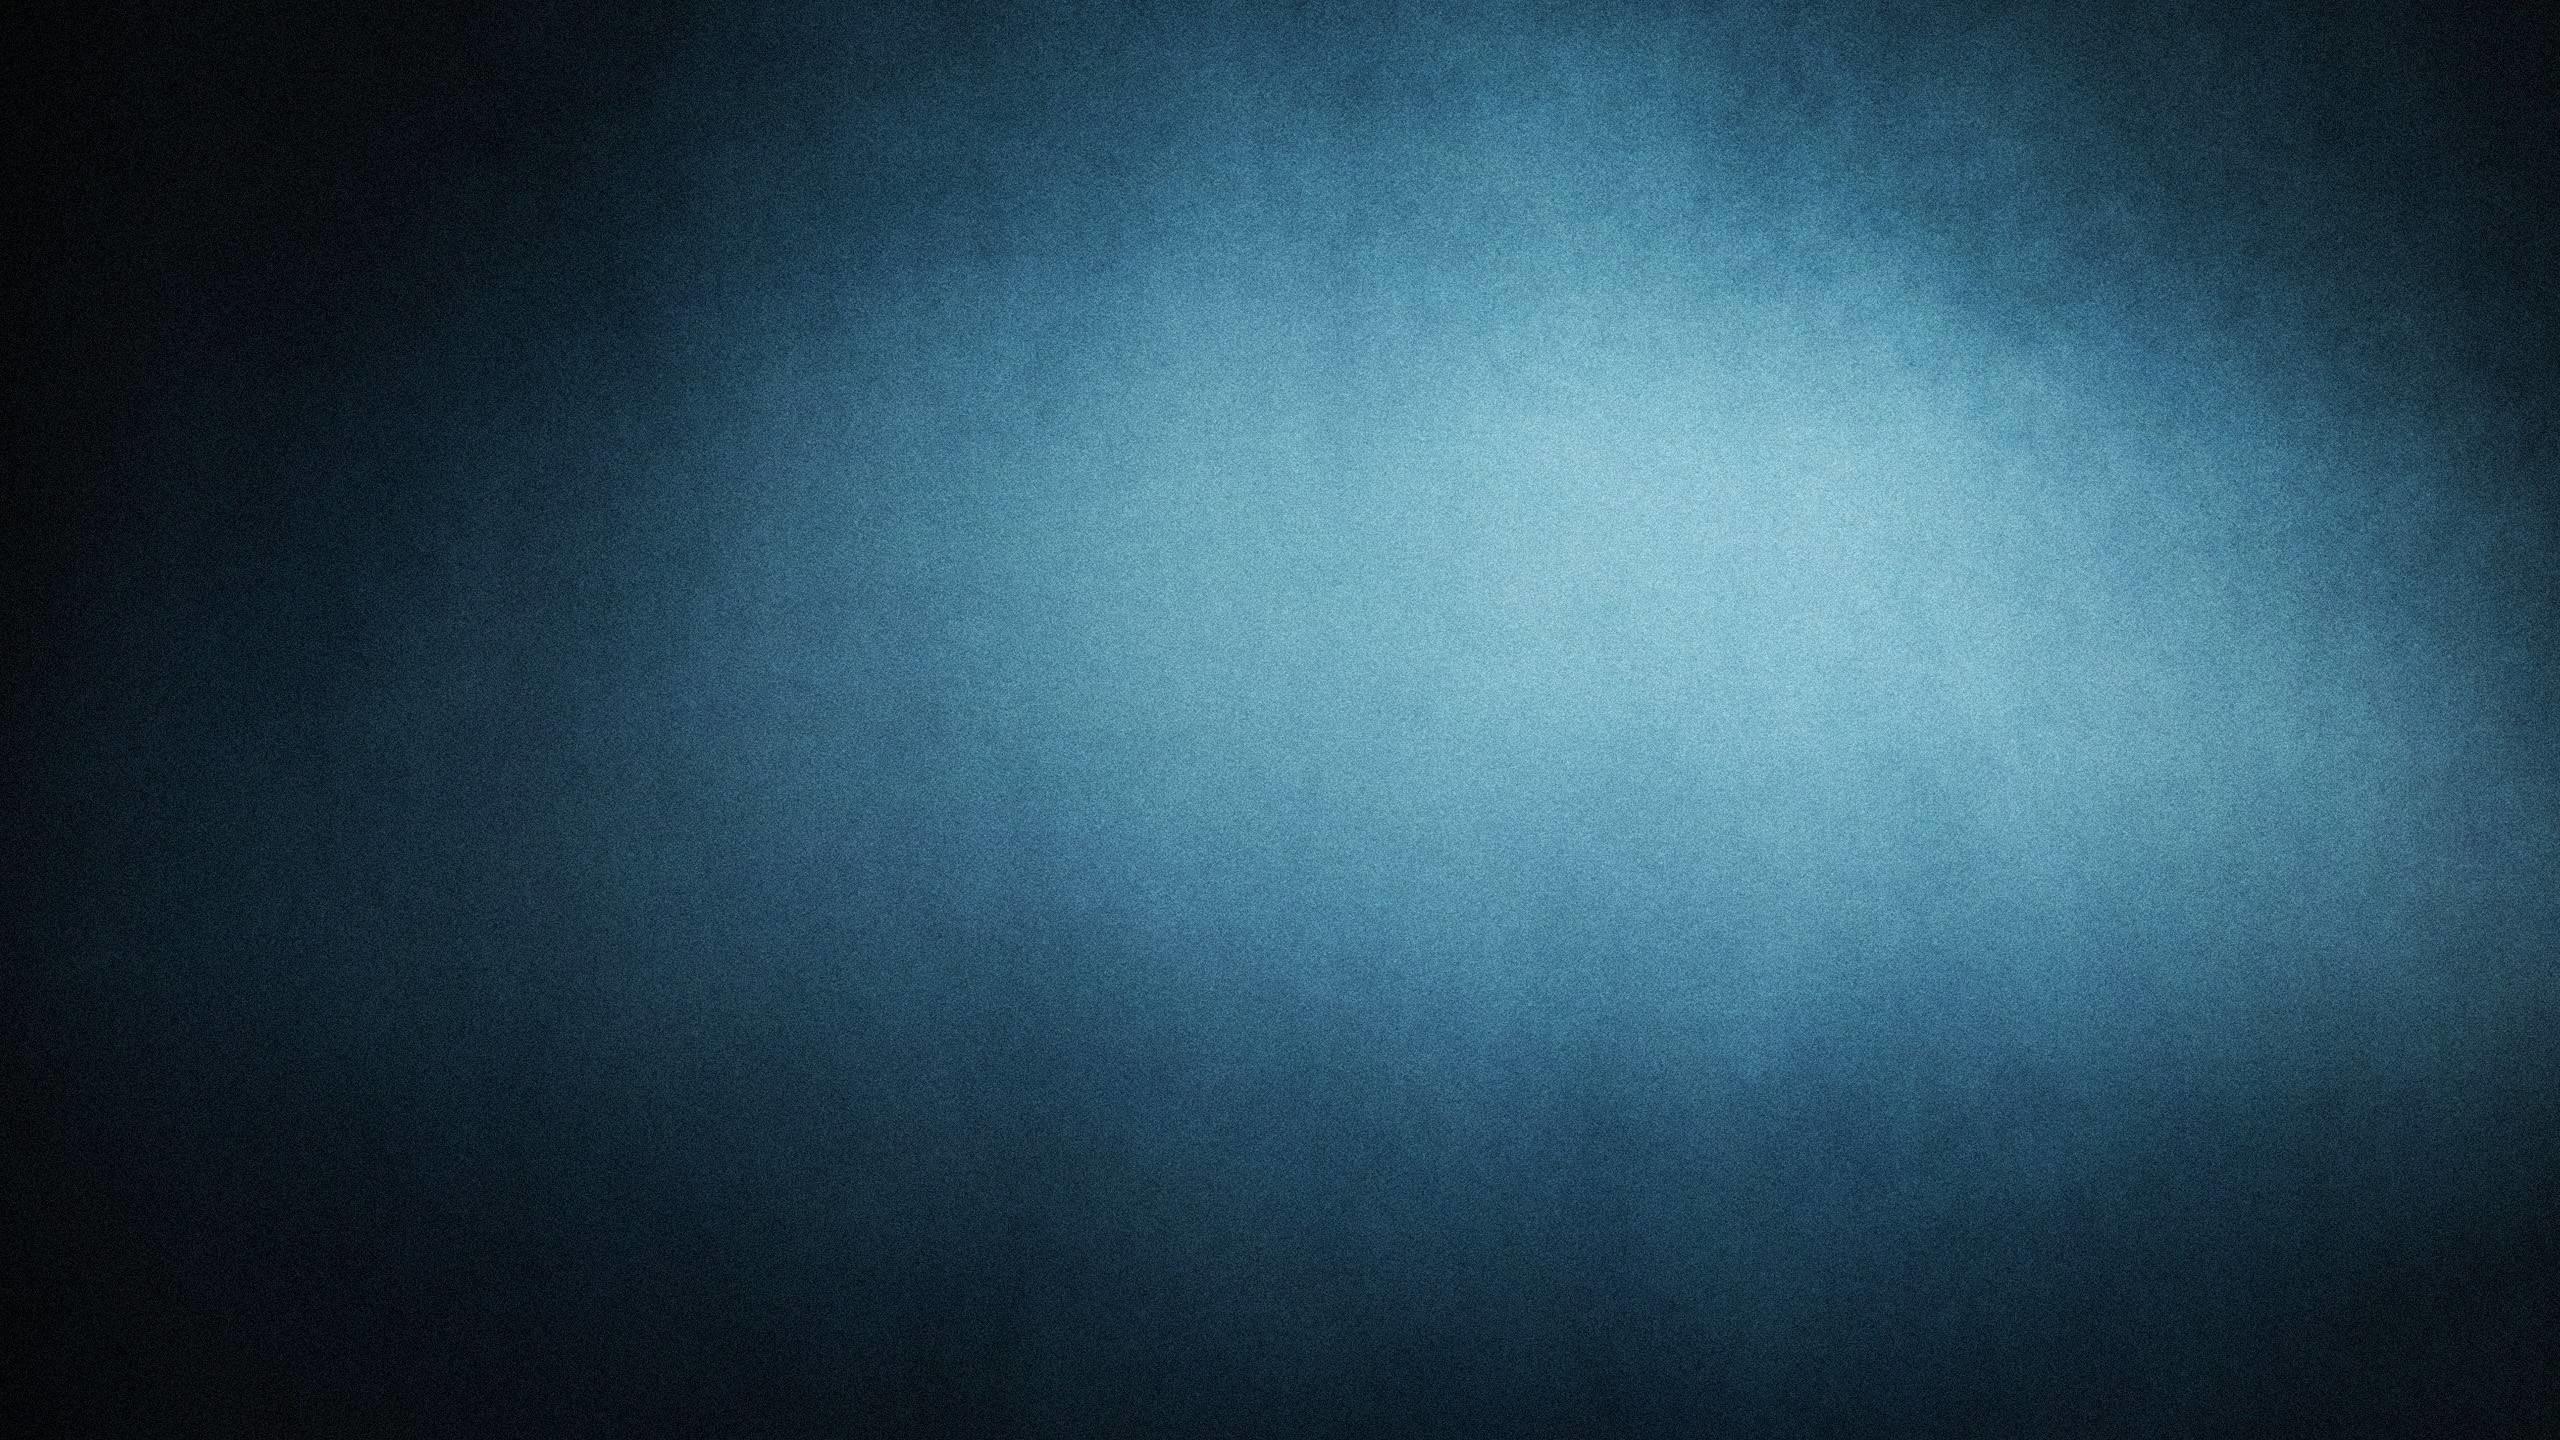 hinh nen mau xanh 38